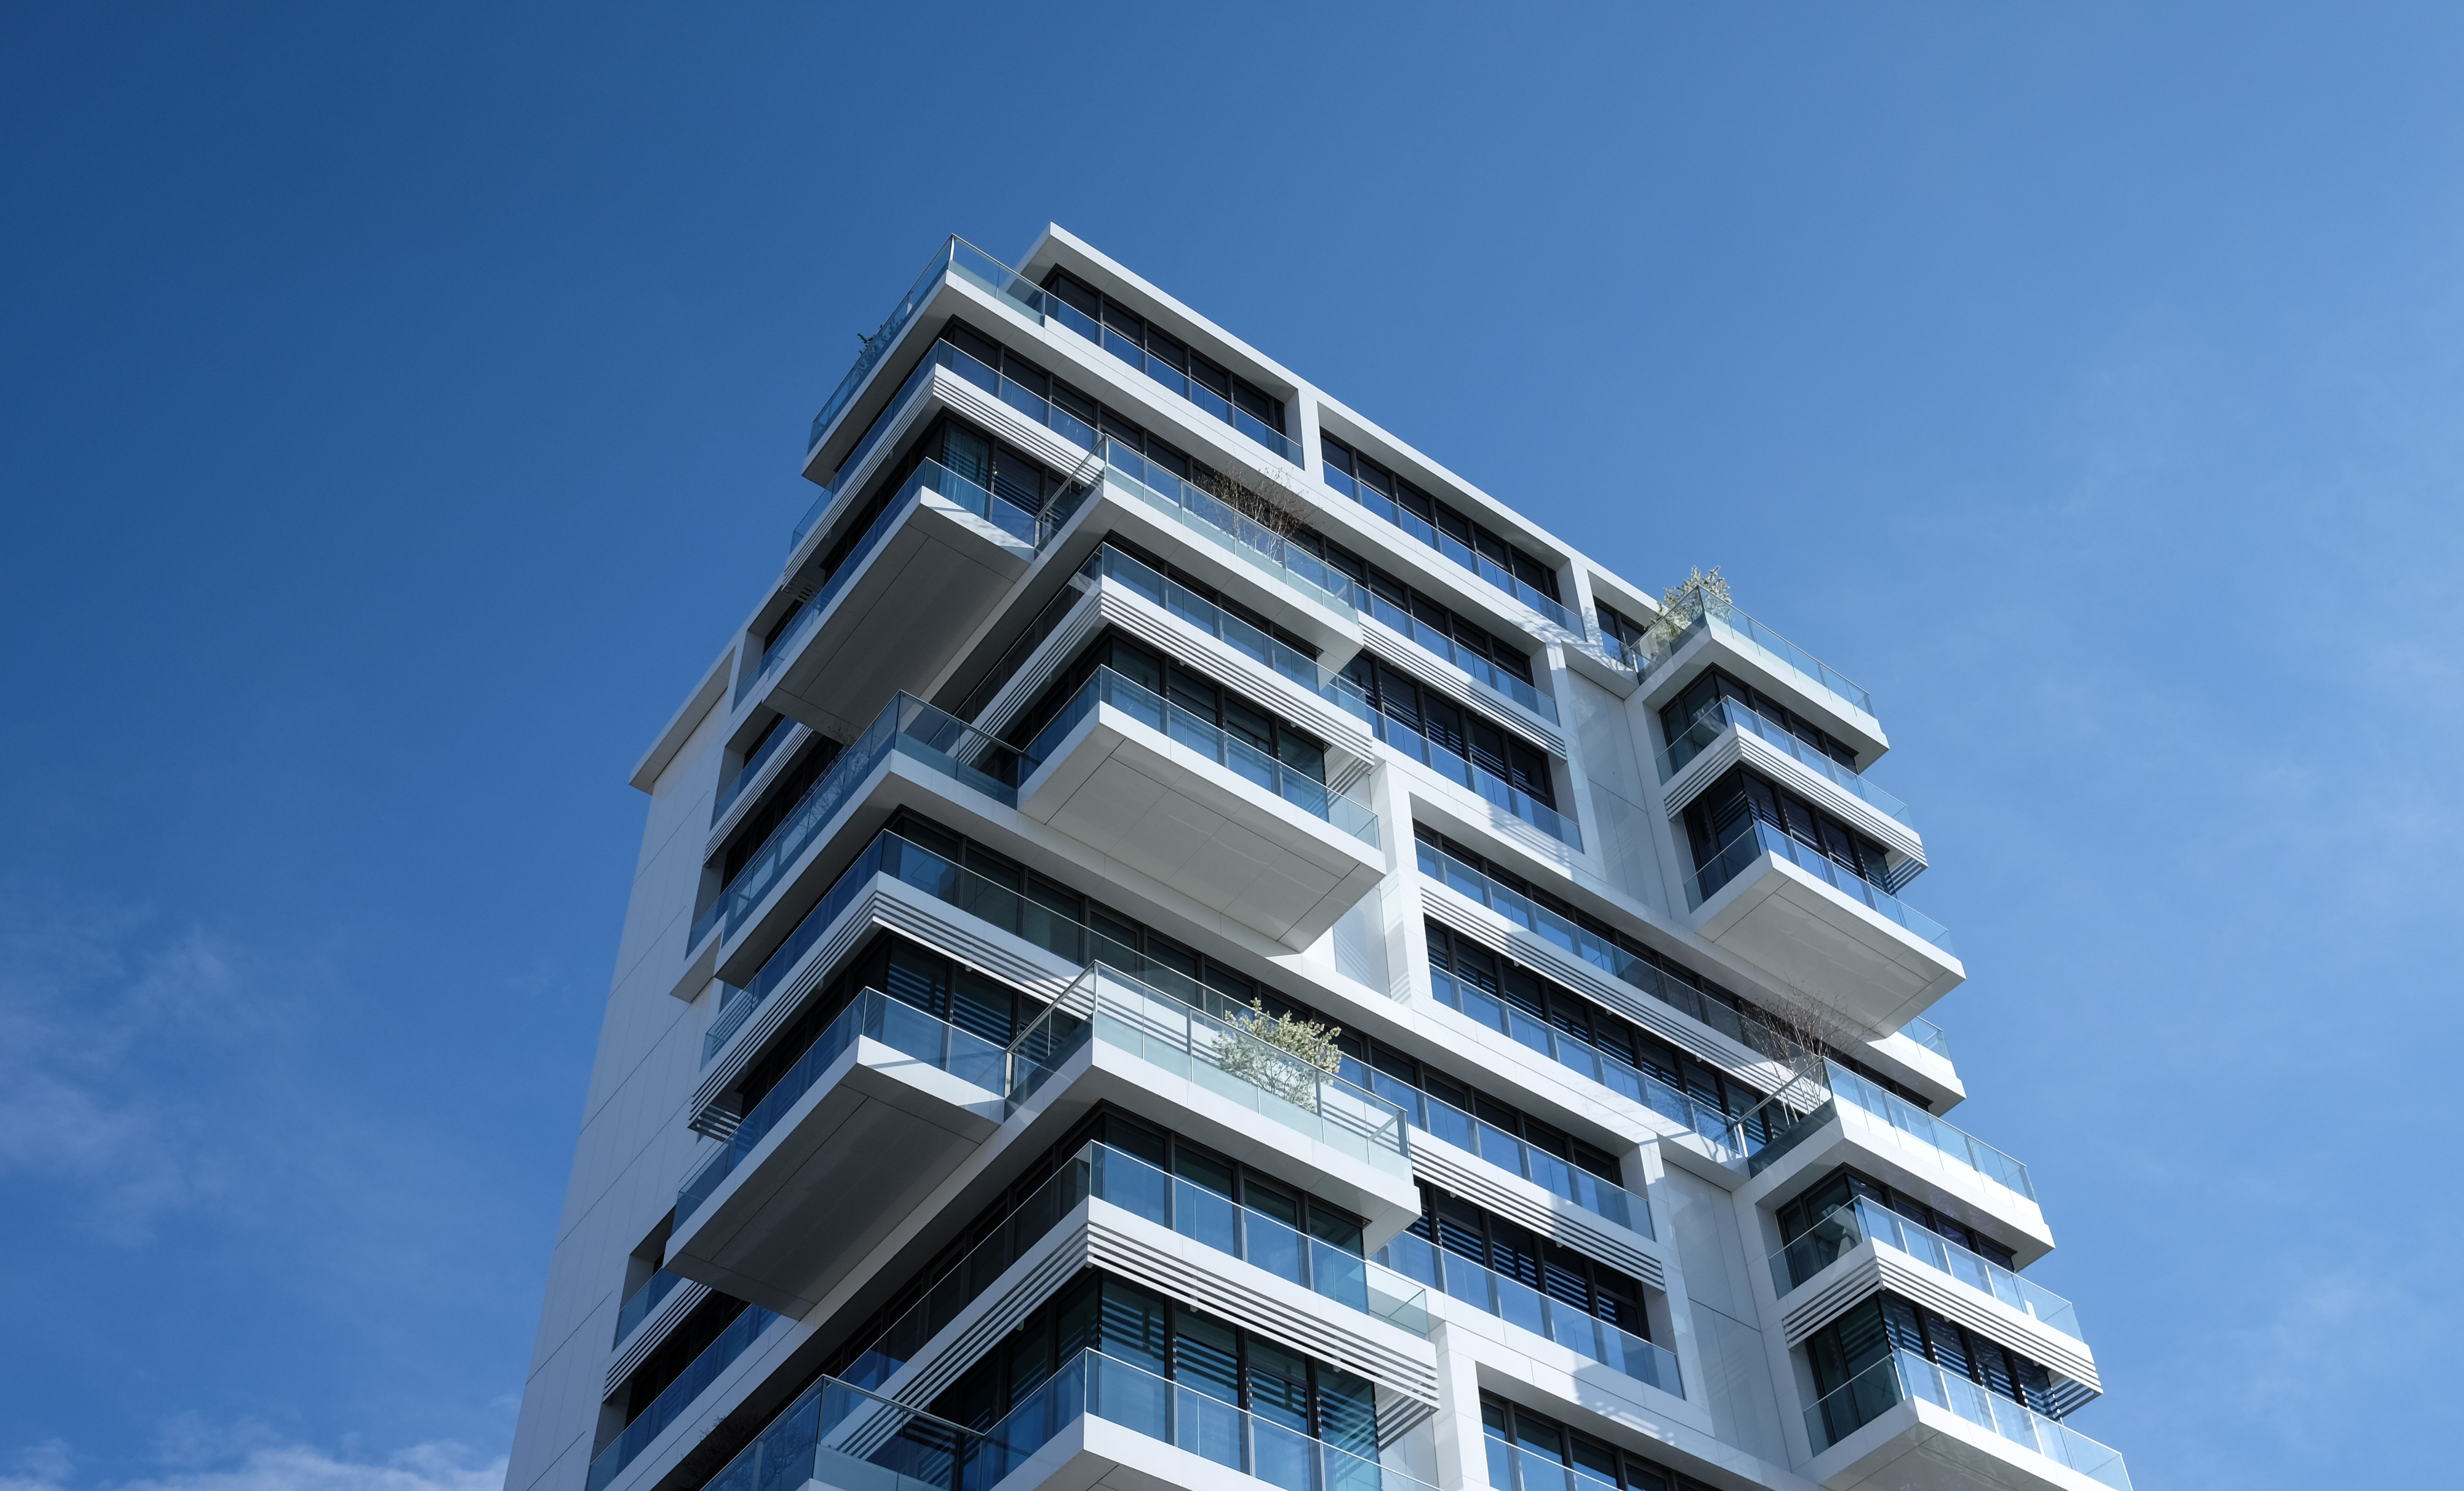 General 4895x2962 architecture building minimalism